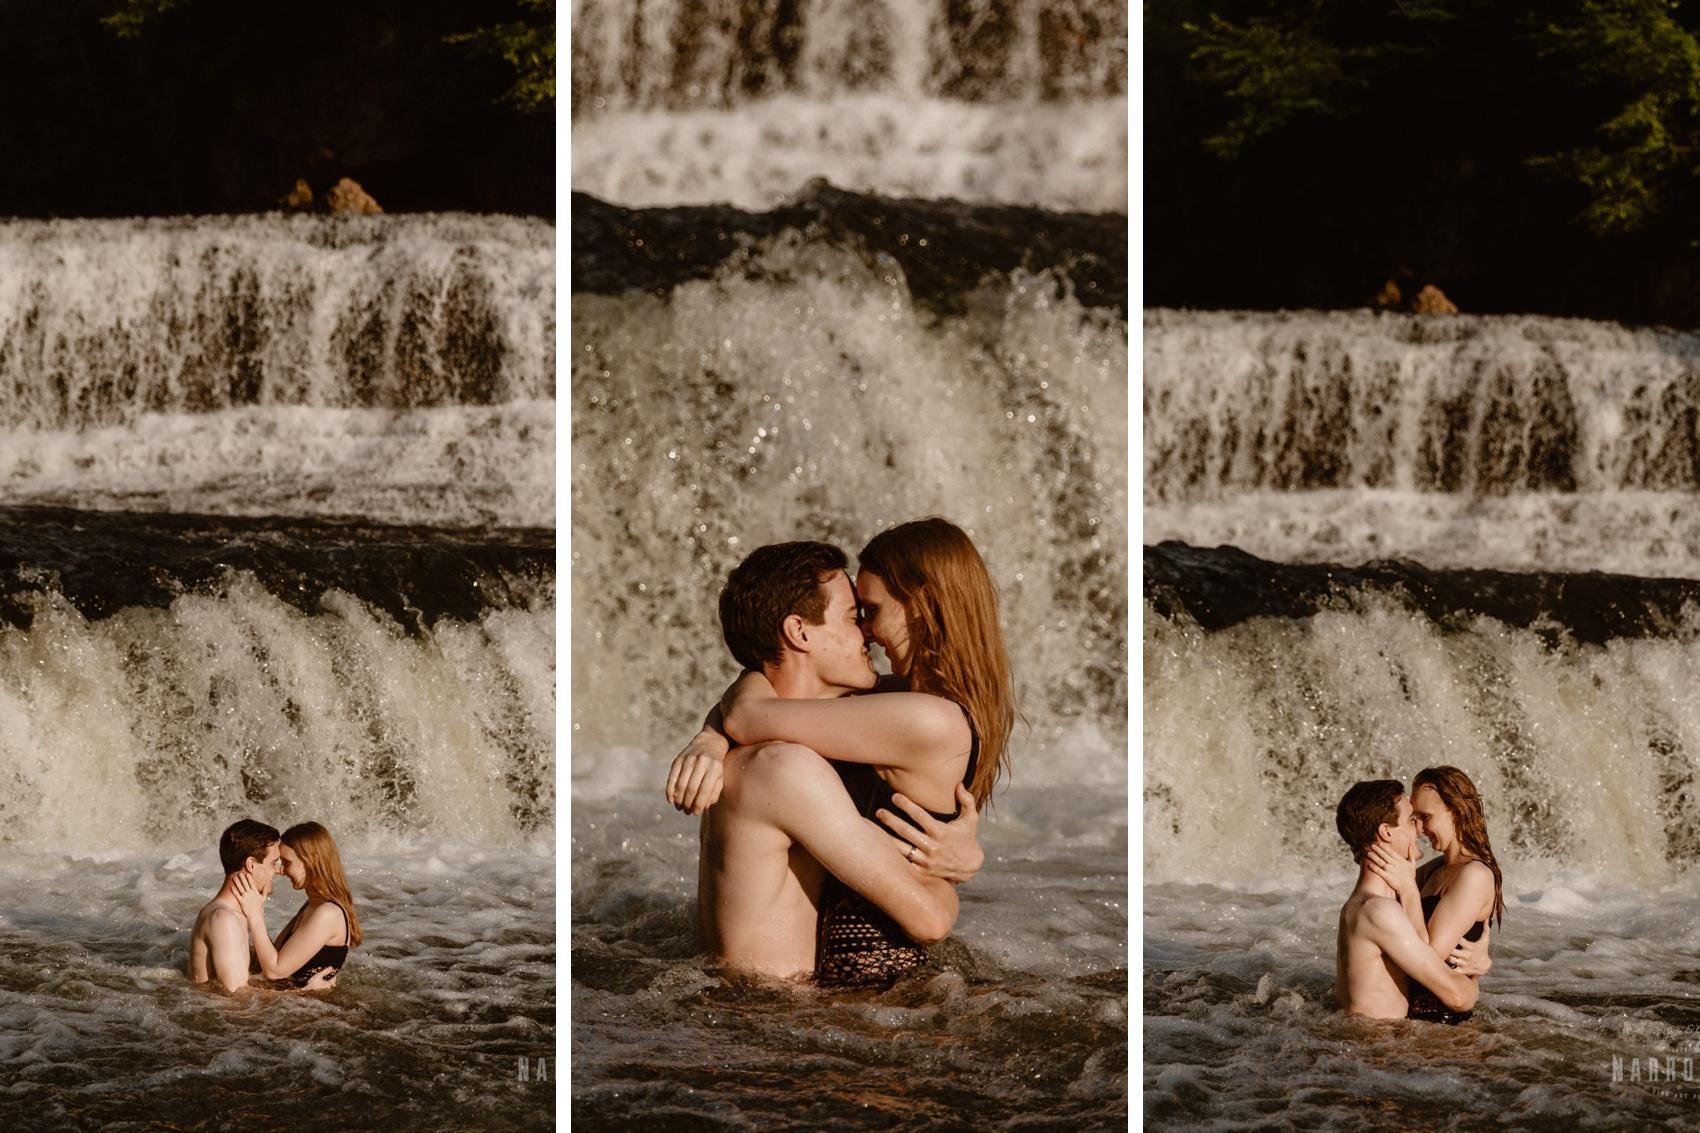 willow-falls-waterfall-adventure-engagement-photographer-015-016.jpg